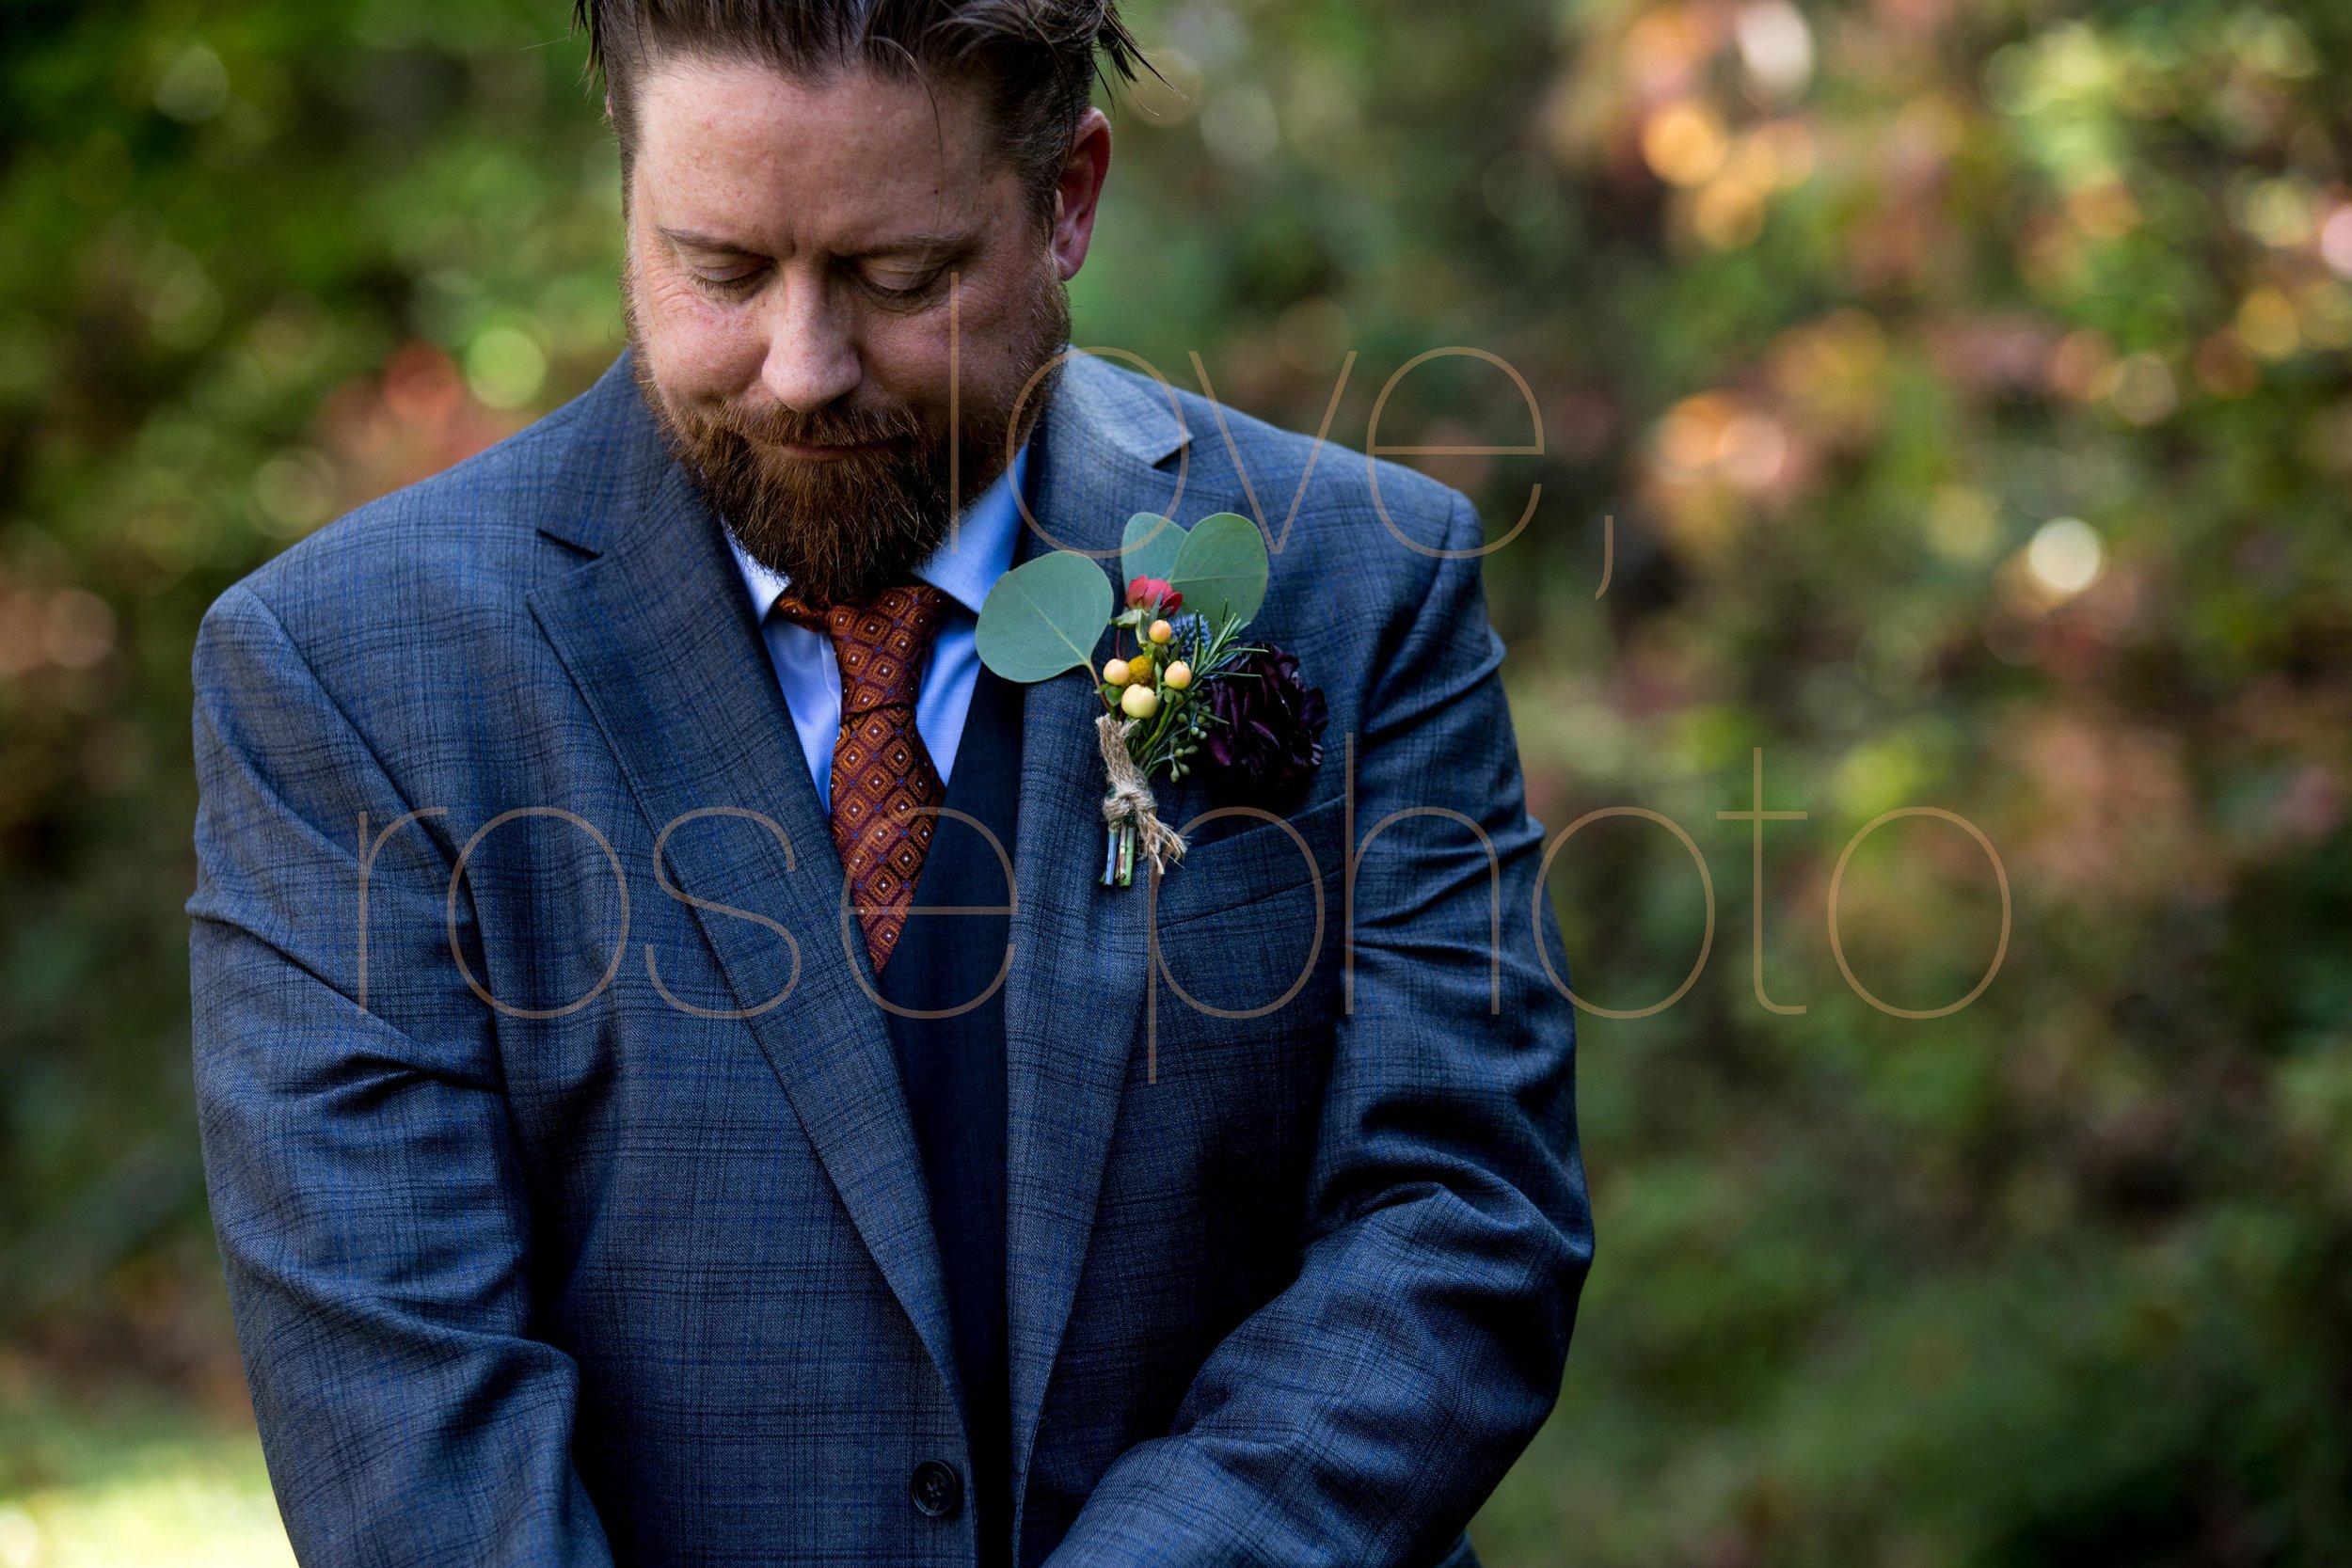 Jane Krame + Jason Ashevegas married asheville best wedding photographers -14.jpg